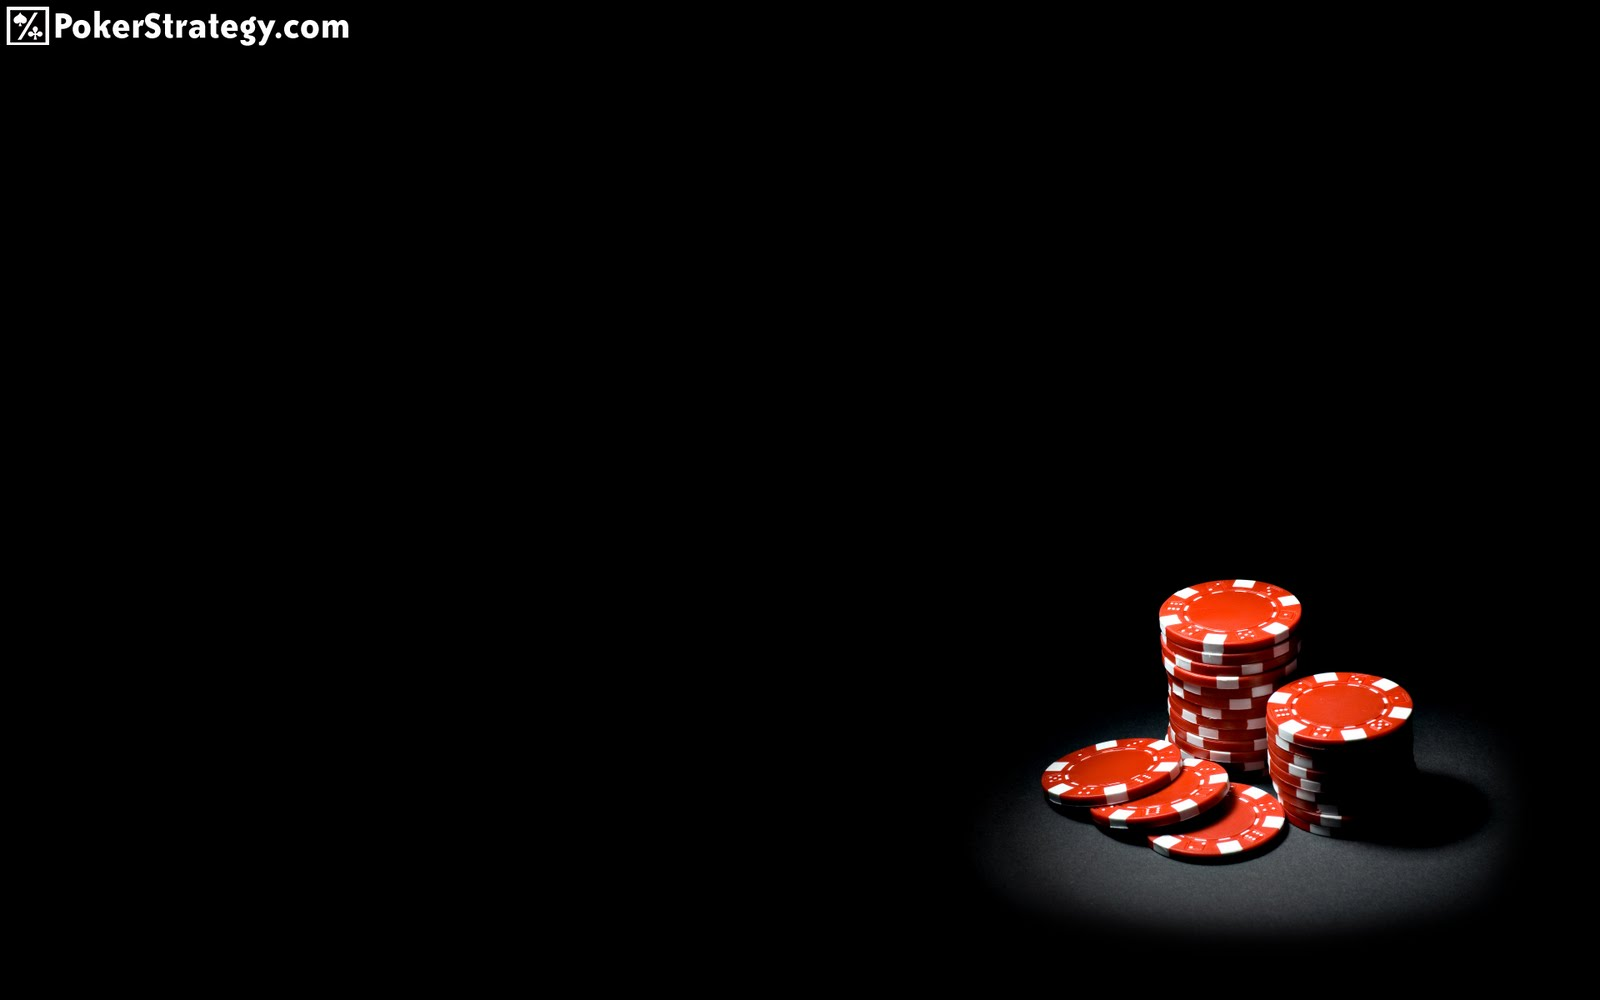 http://4.bp.blogspot.com/-0d4NurPA6T8/TfCf1LyE6HI/AAAAAAAAAh0/0UCBQgiNBqI/s1600/online_game_poker_players_and_beautiful_girl_wallpaper.jpg